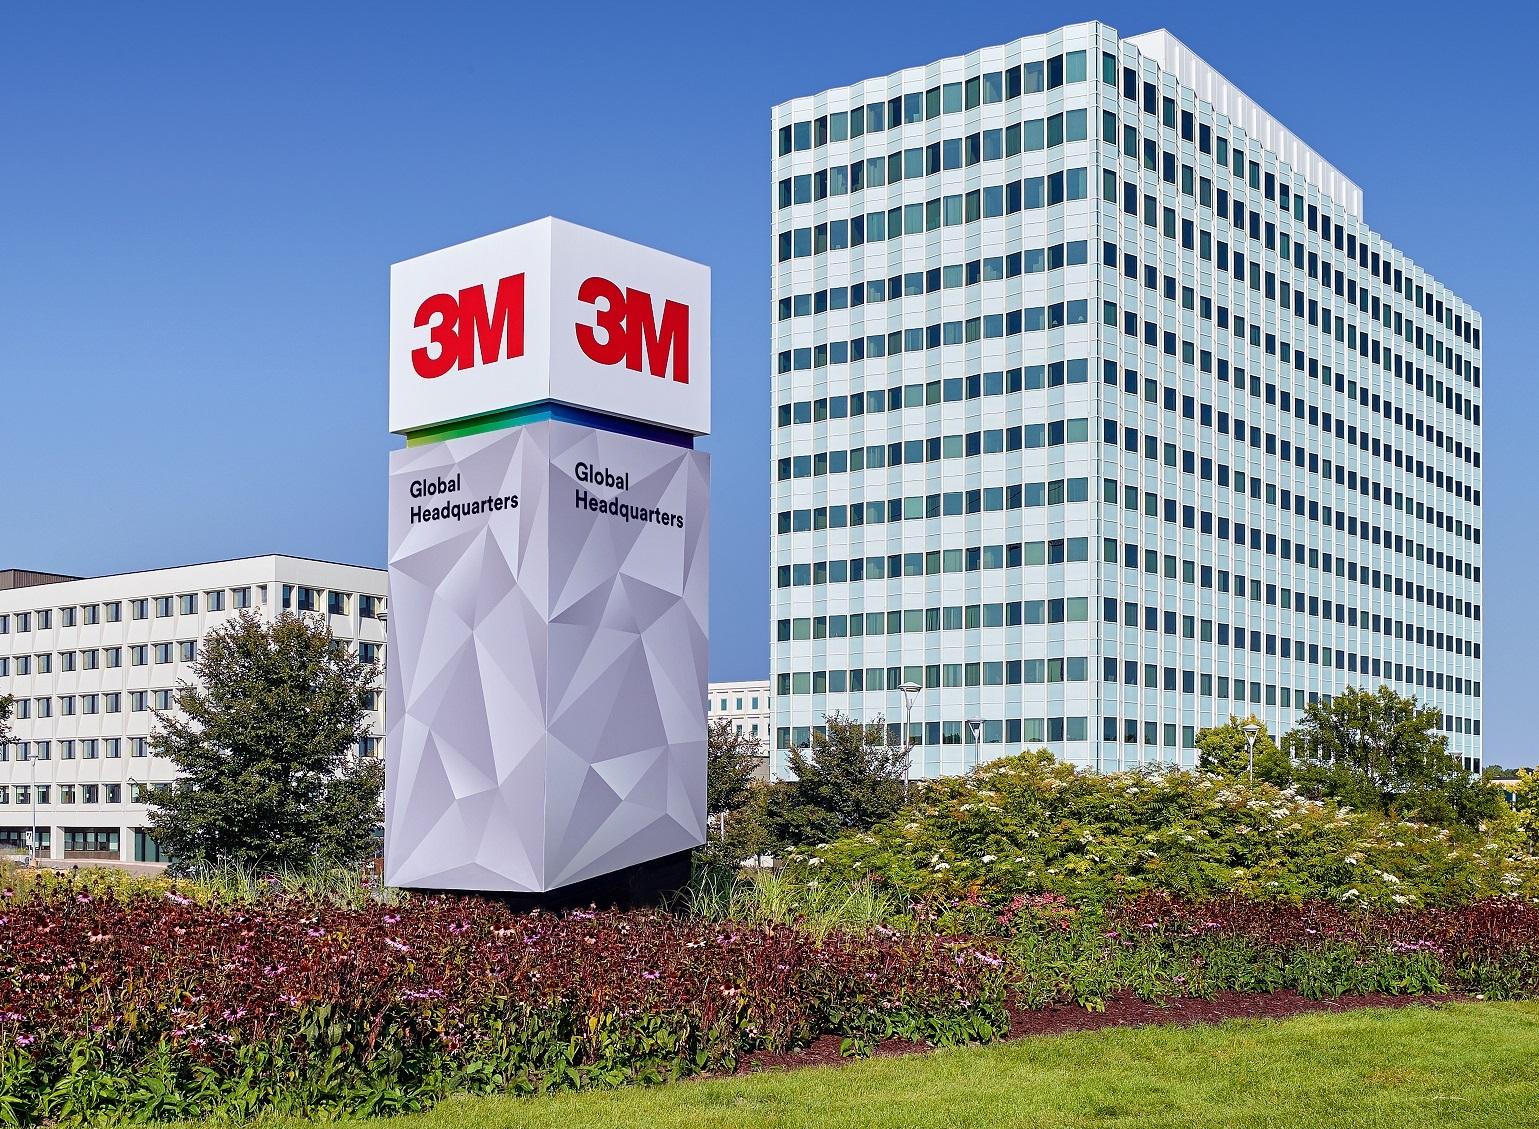 Buildings at 3M headquarters